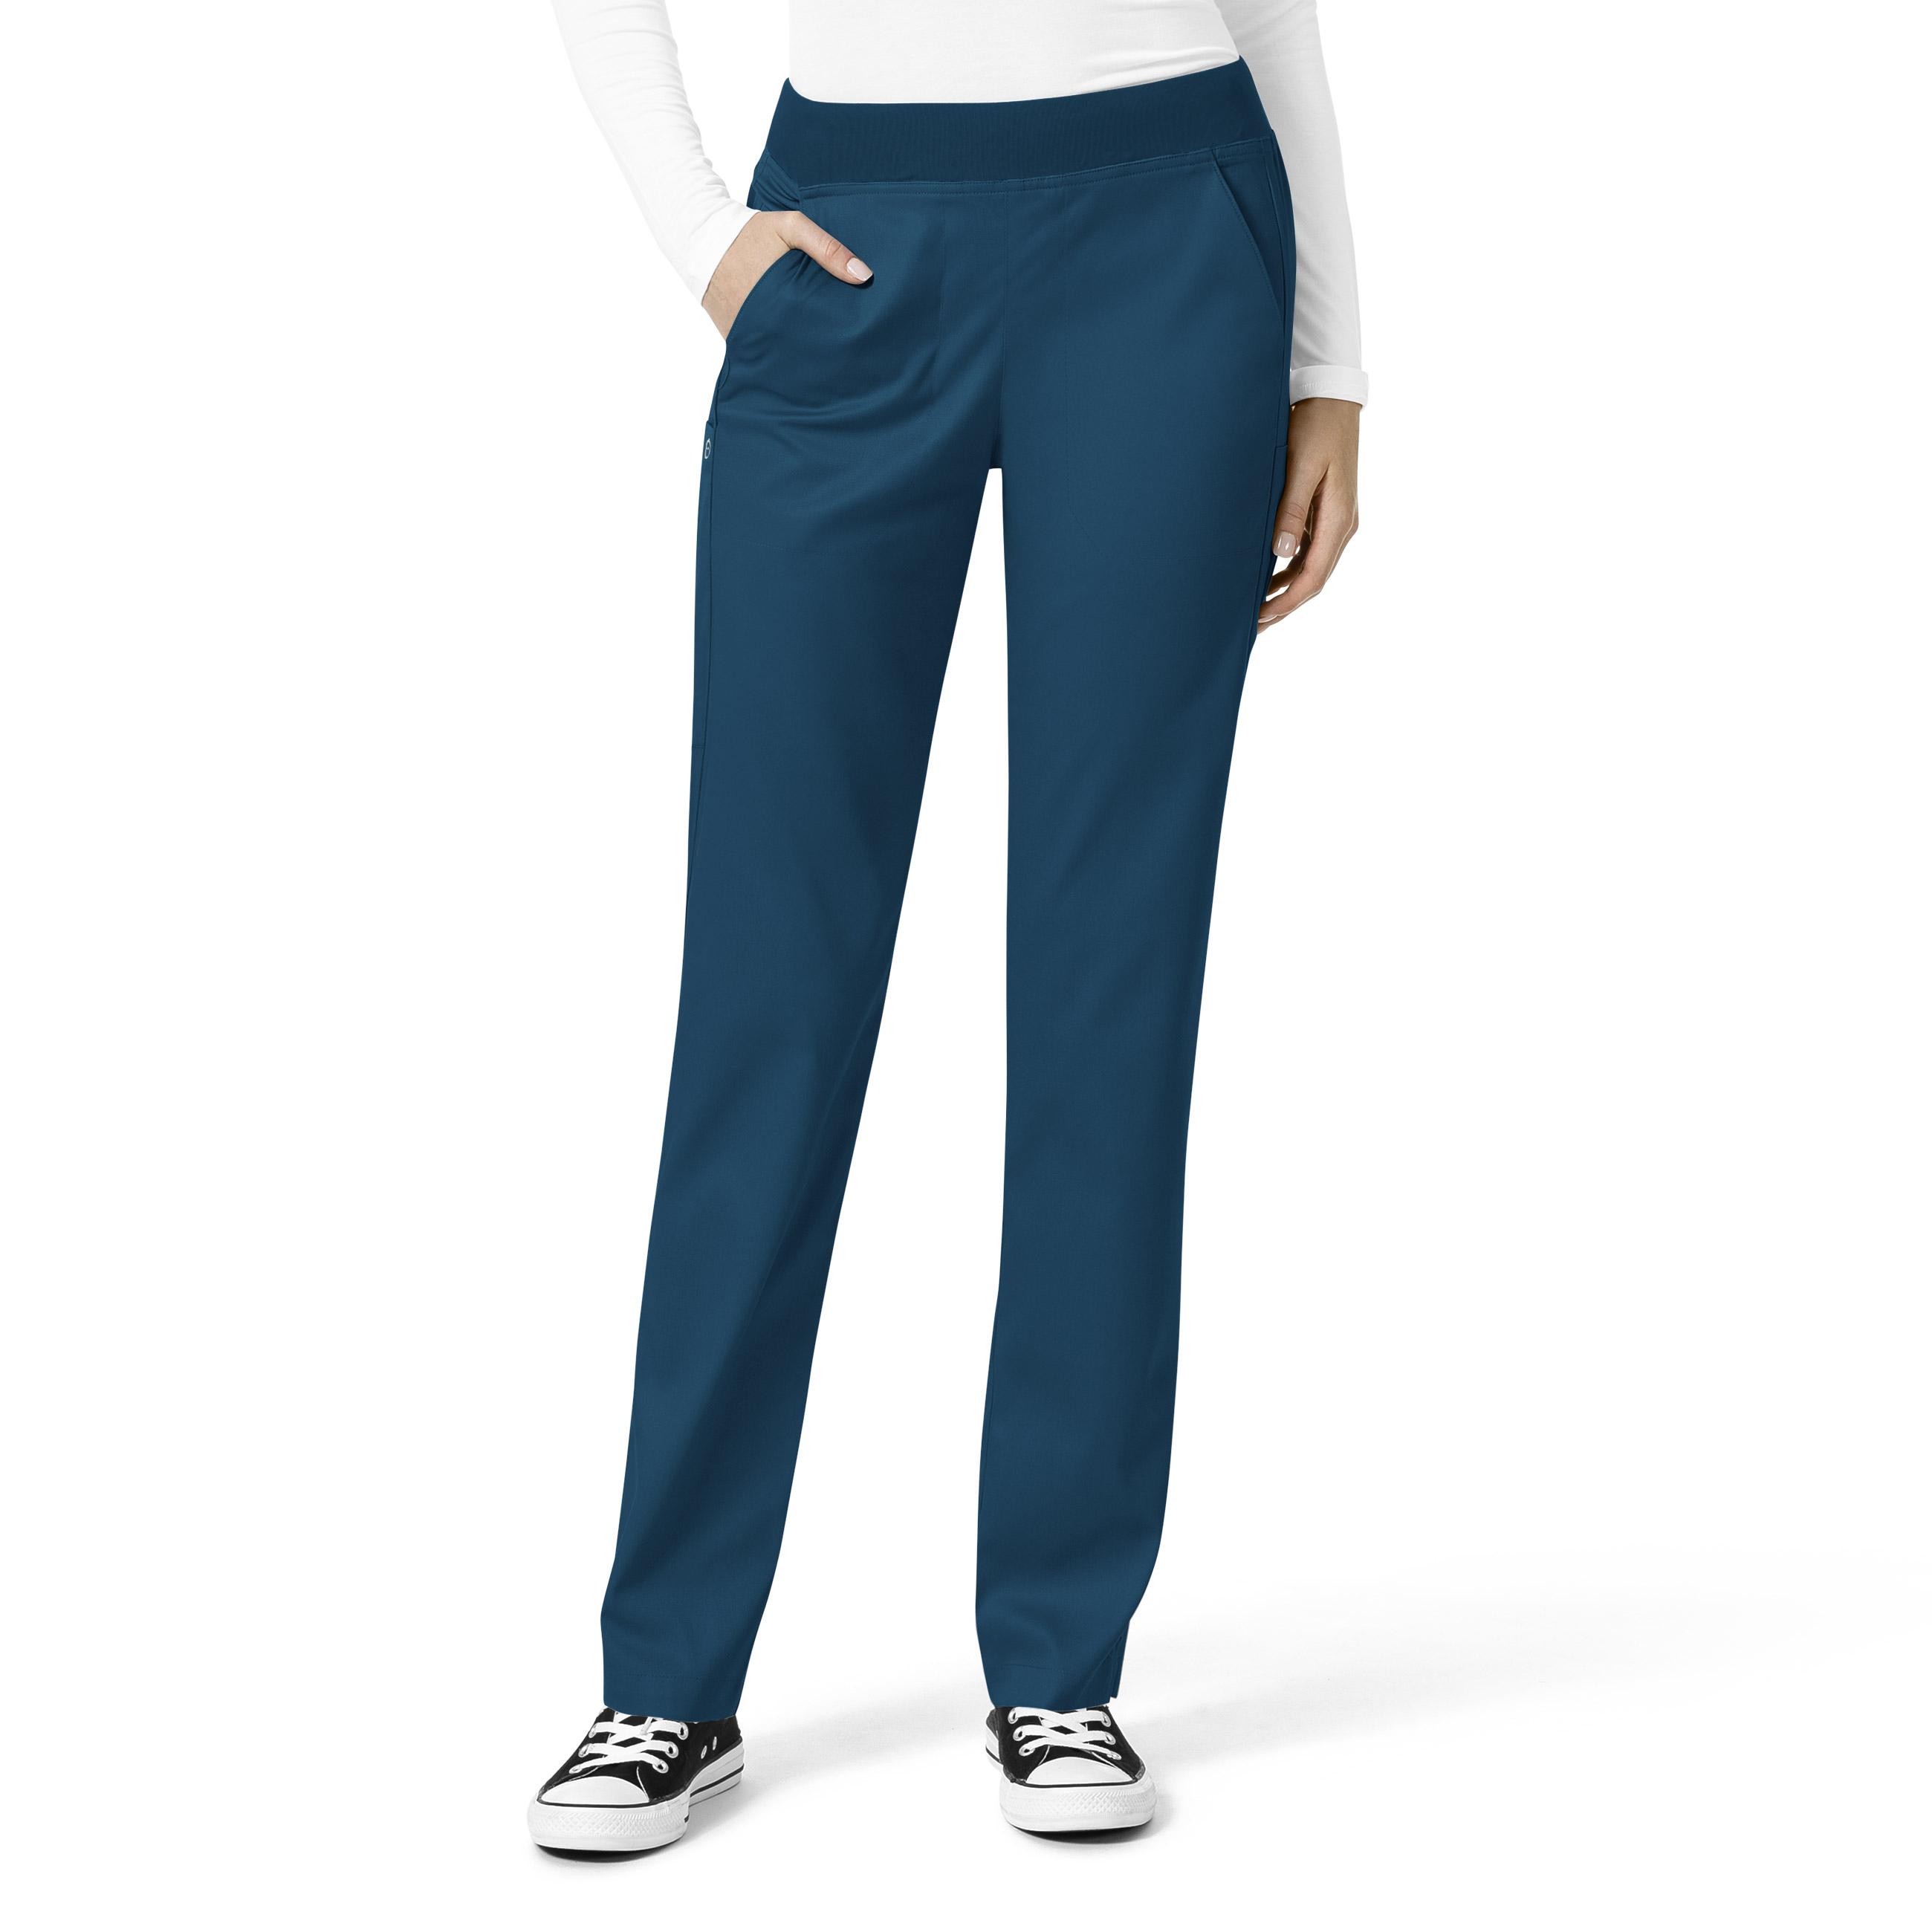 Pantalón femenino